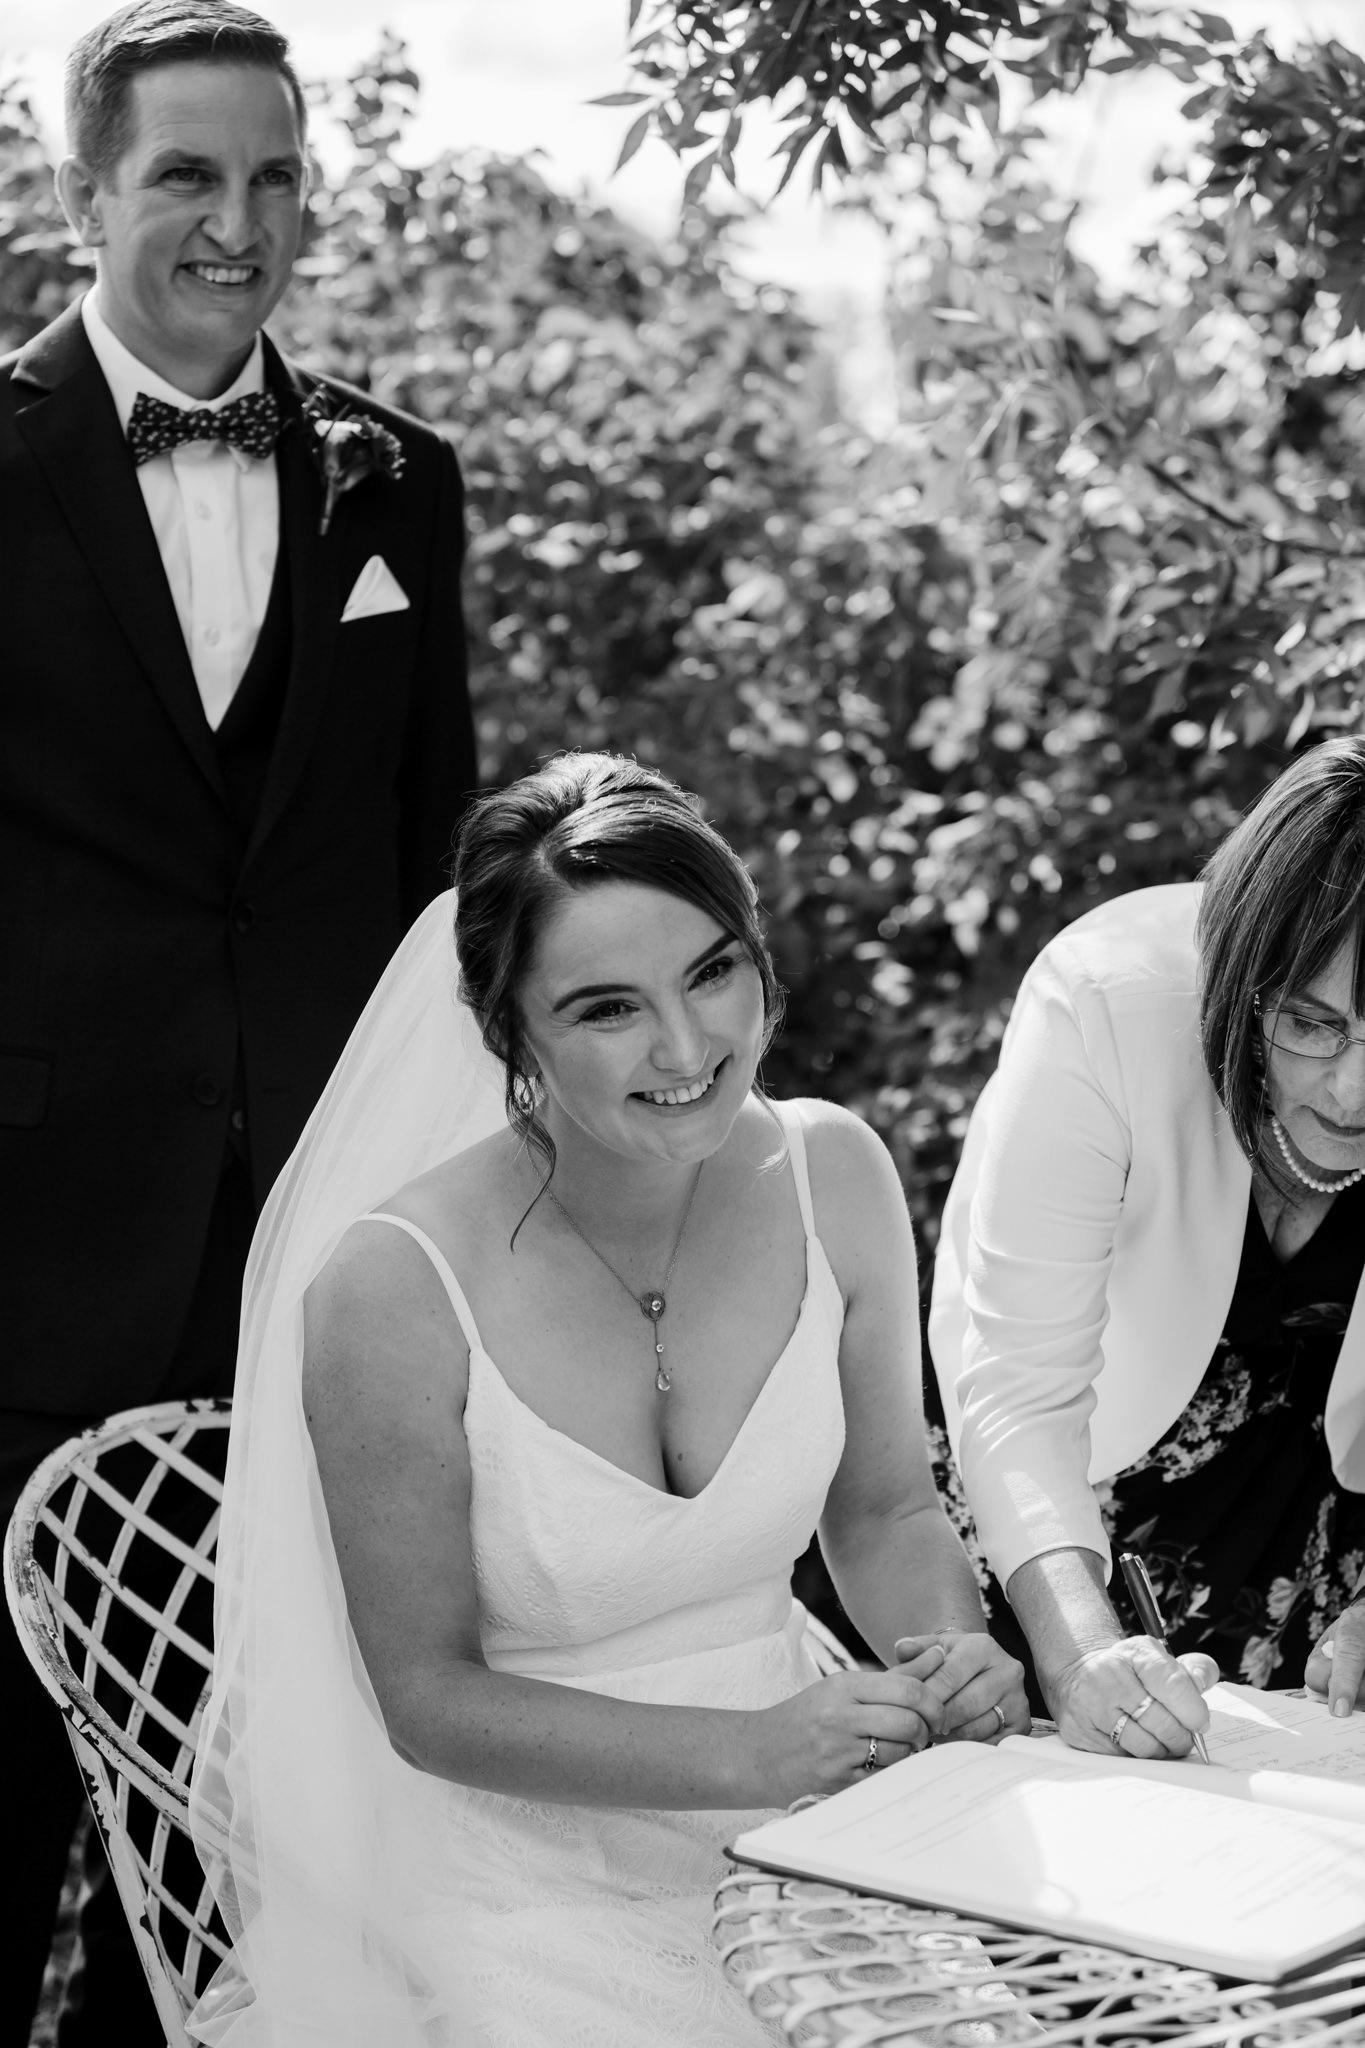 Erin Latimore Mudgee Canberra Wedding Photographer ROSEBANK GUESTHOUSE OLD THEATRE TONIC MILLTHORPE_276.JPG